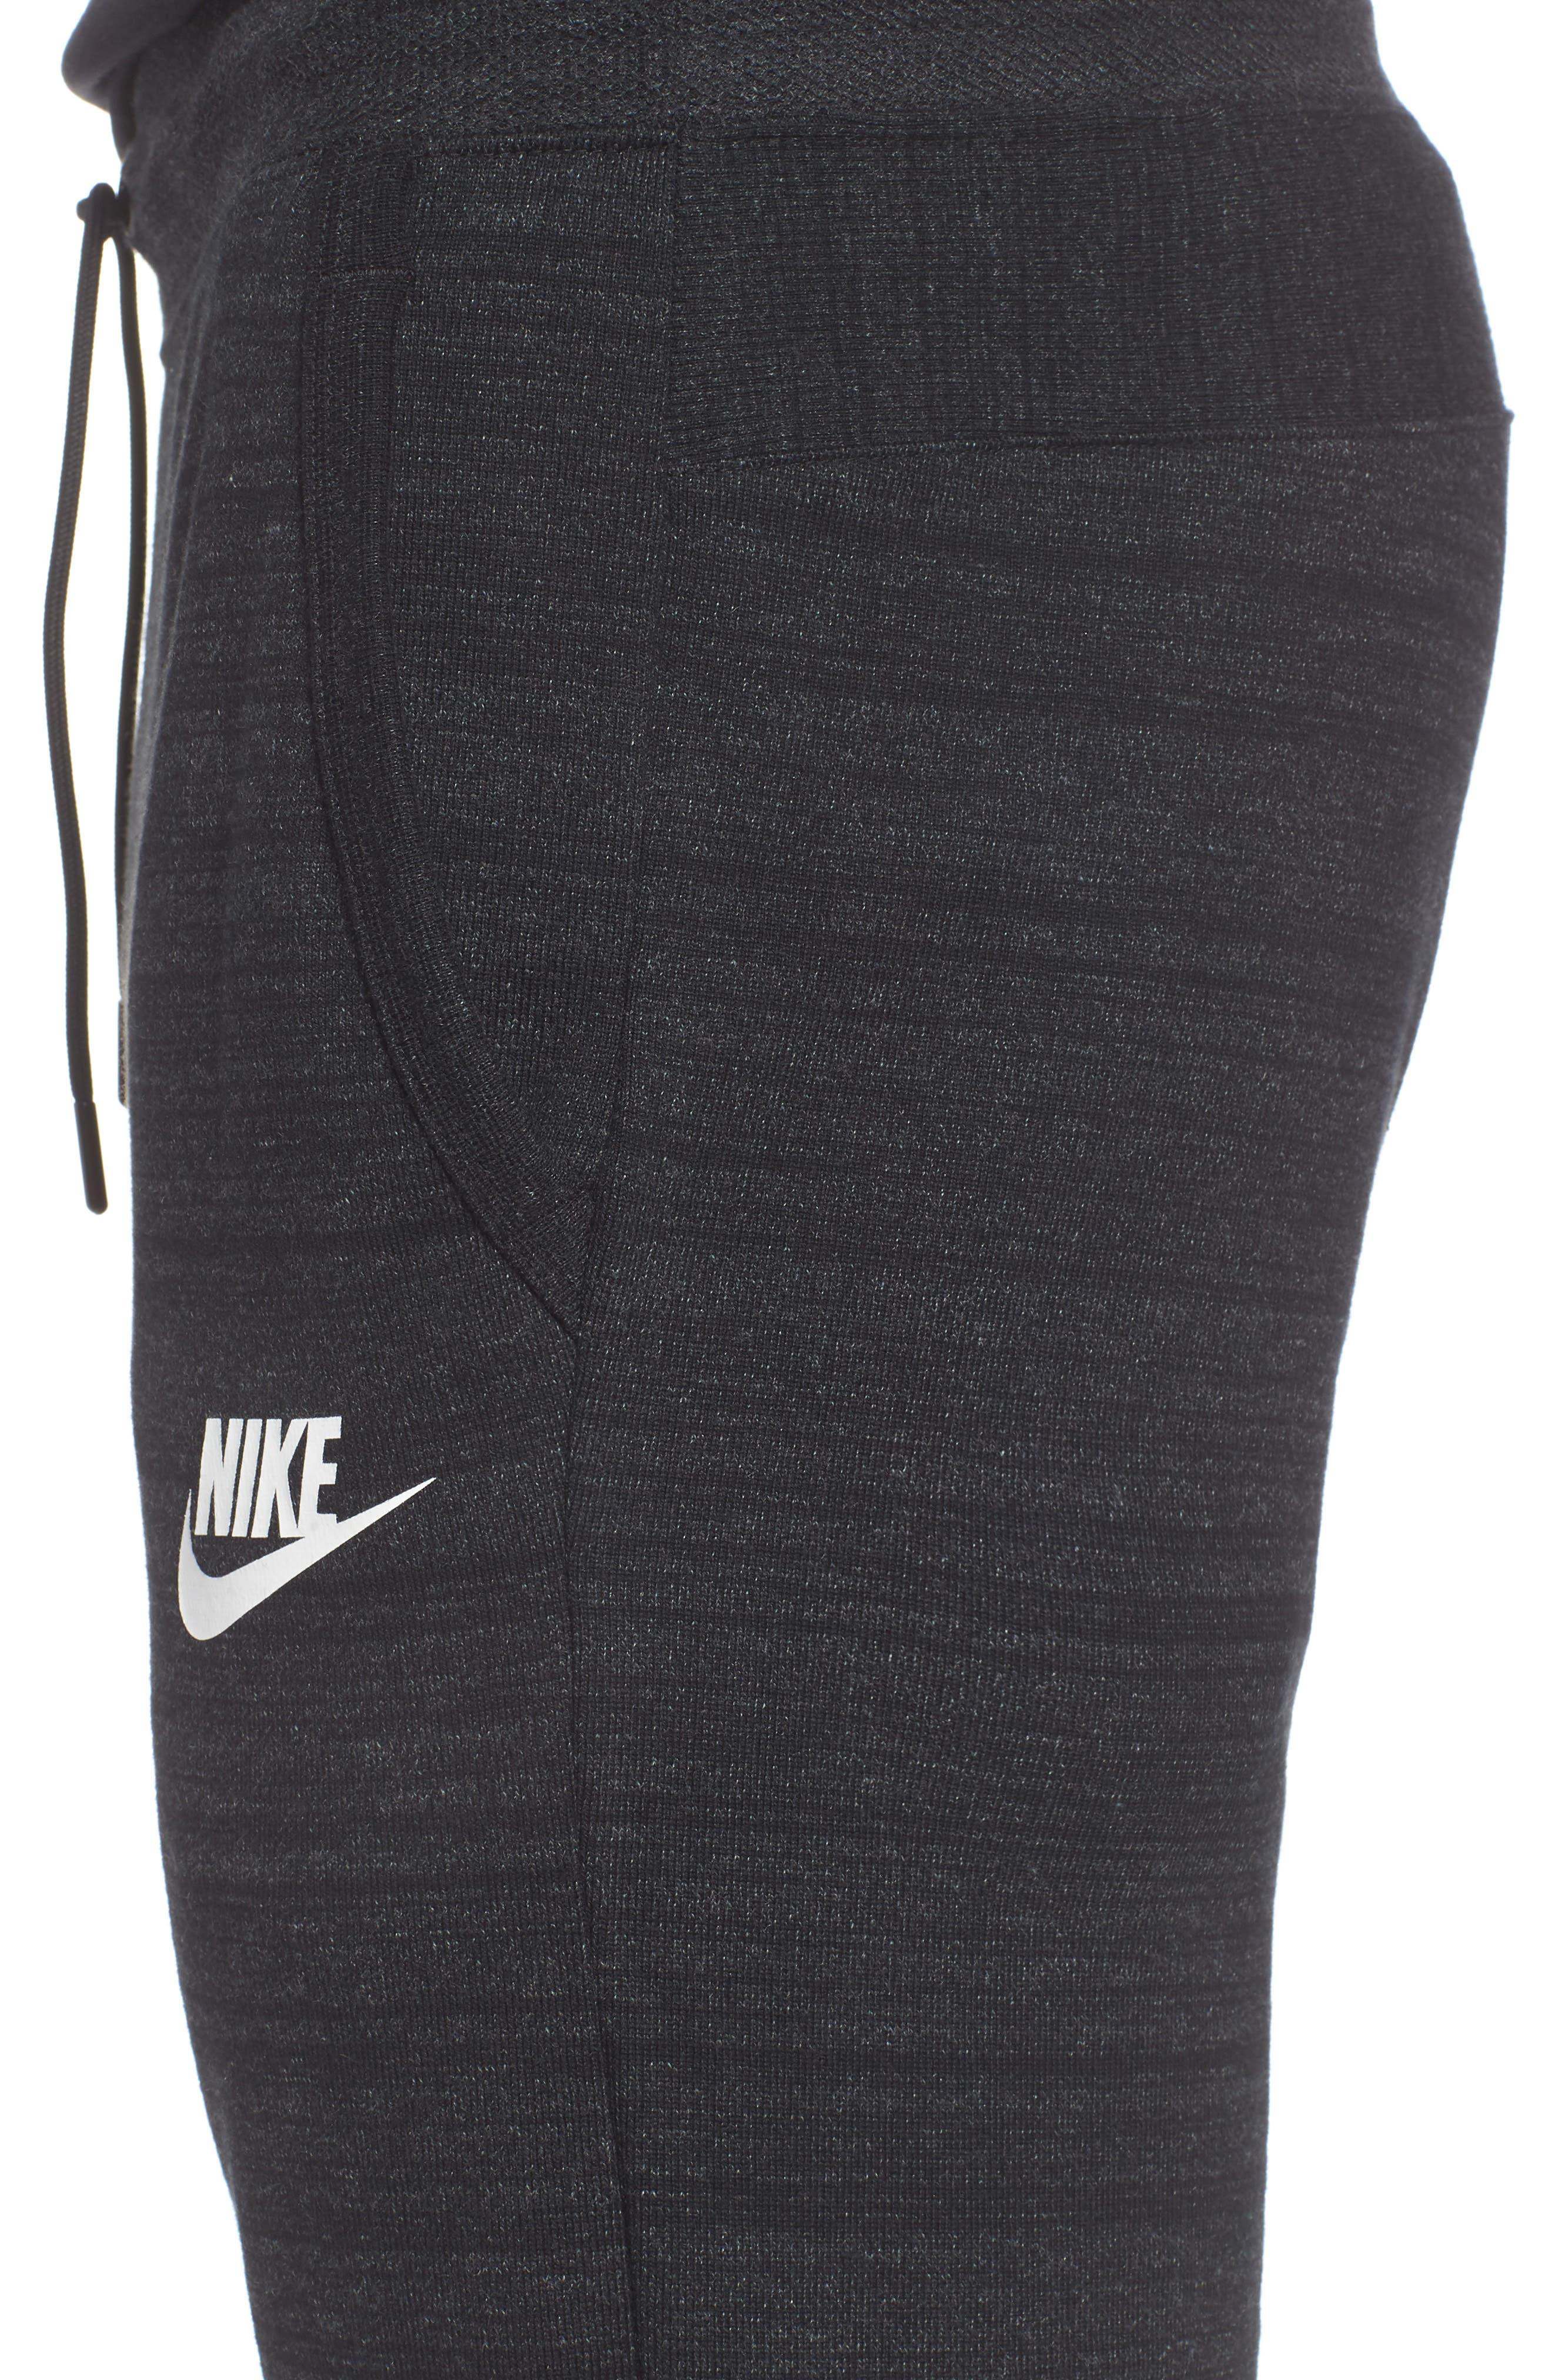 NSW Advance 15 Jogger Pants,                             Alternate thumbnail 4, color,                             BLACK/ HEATHER/ WHITE